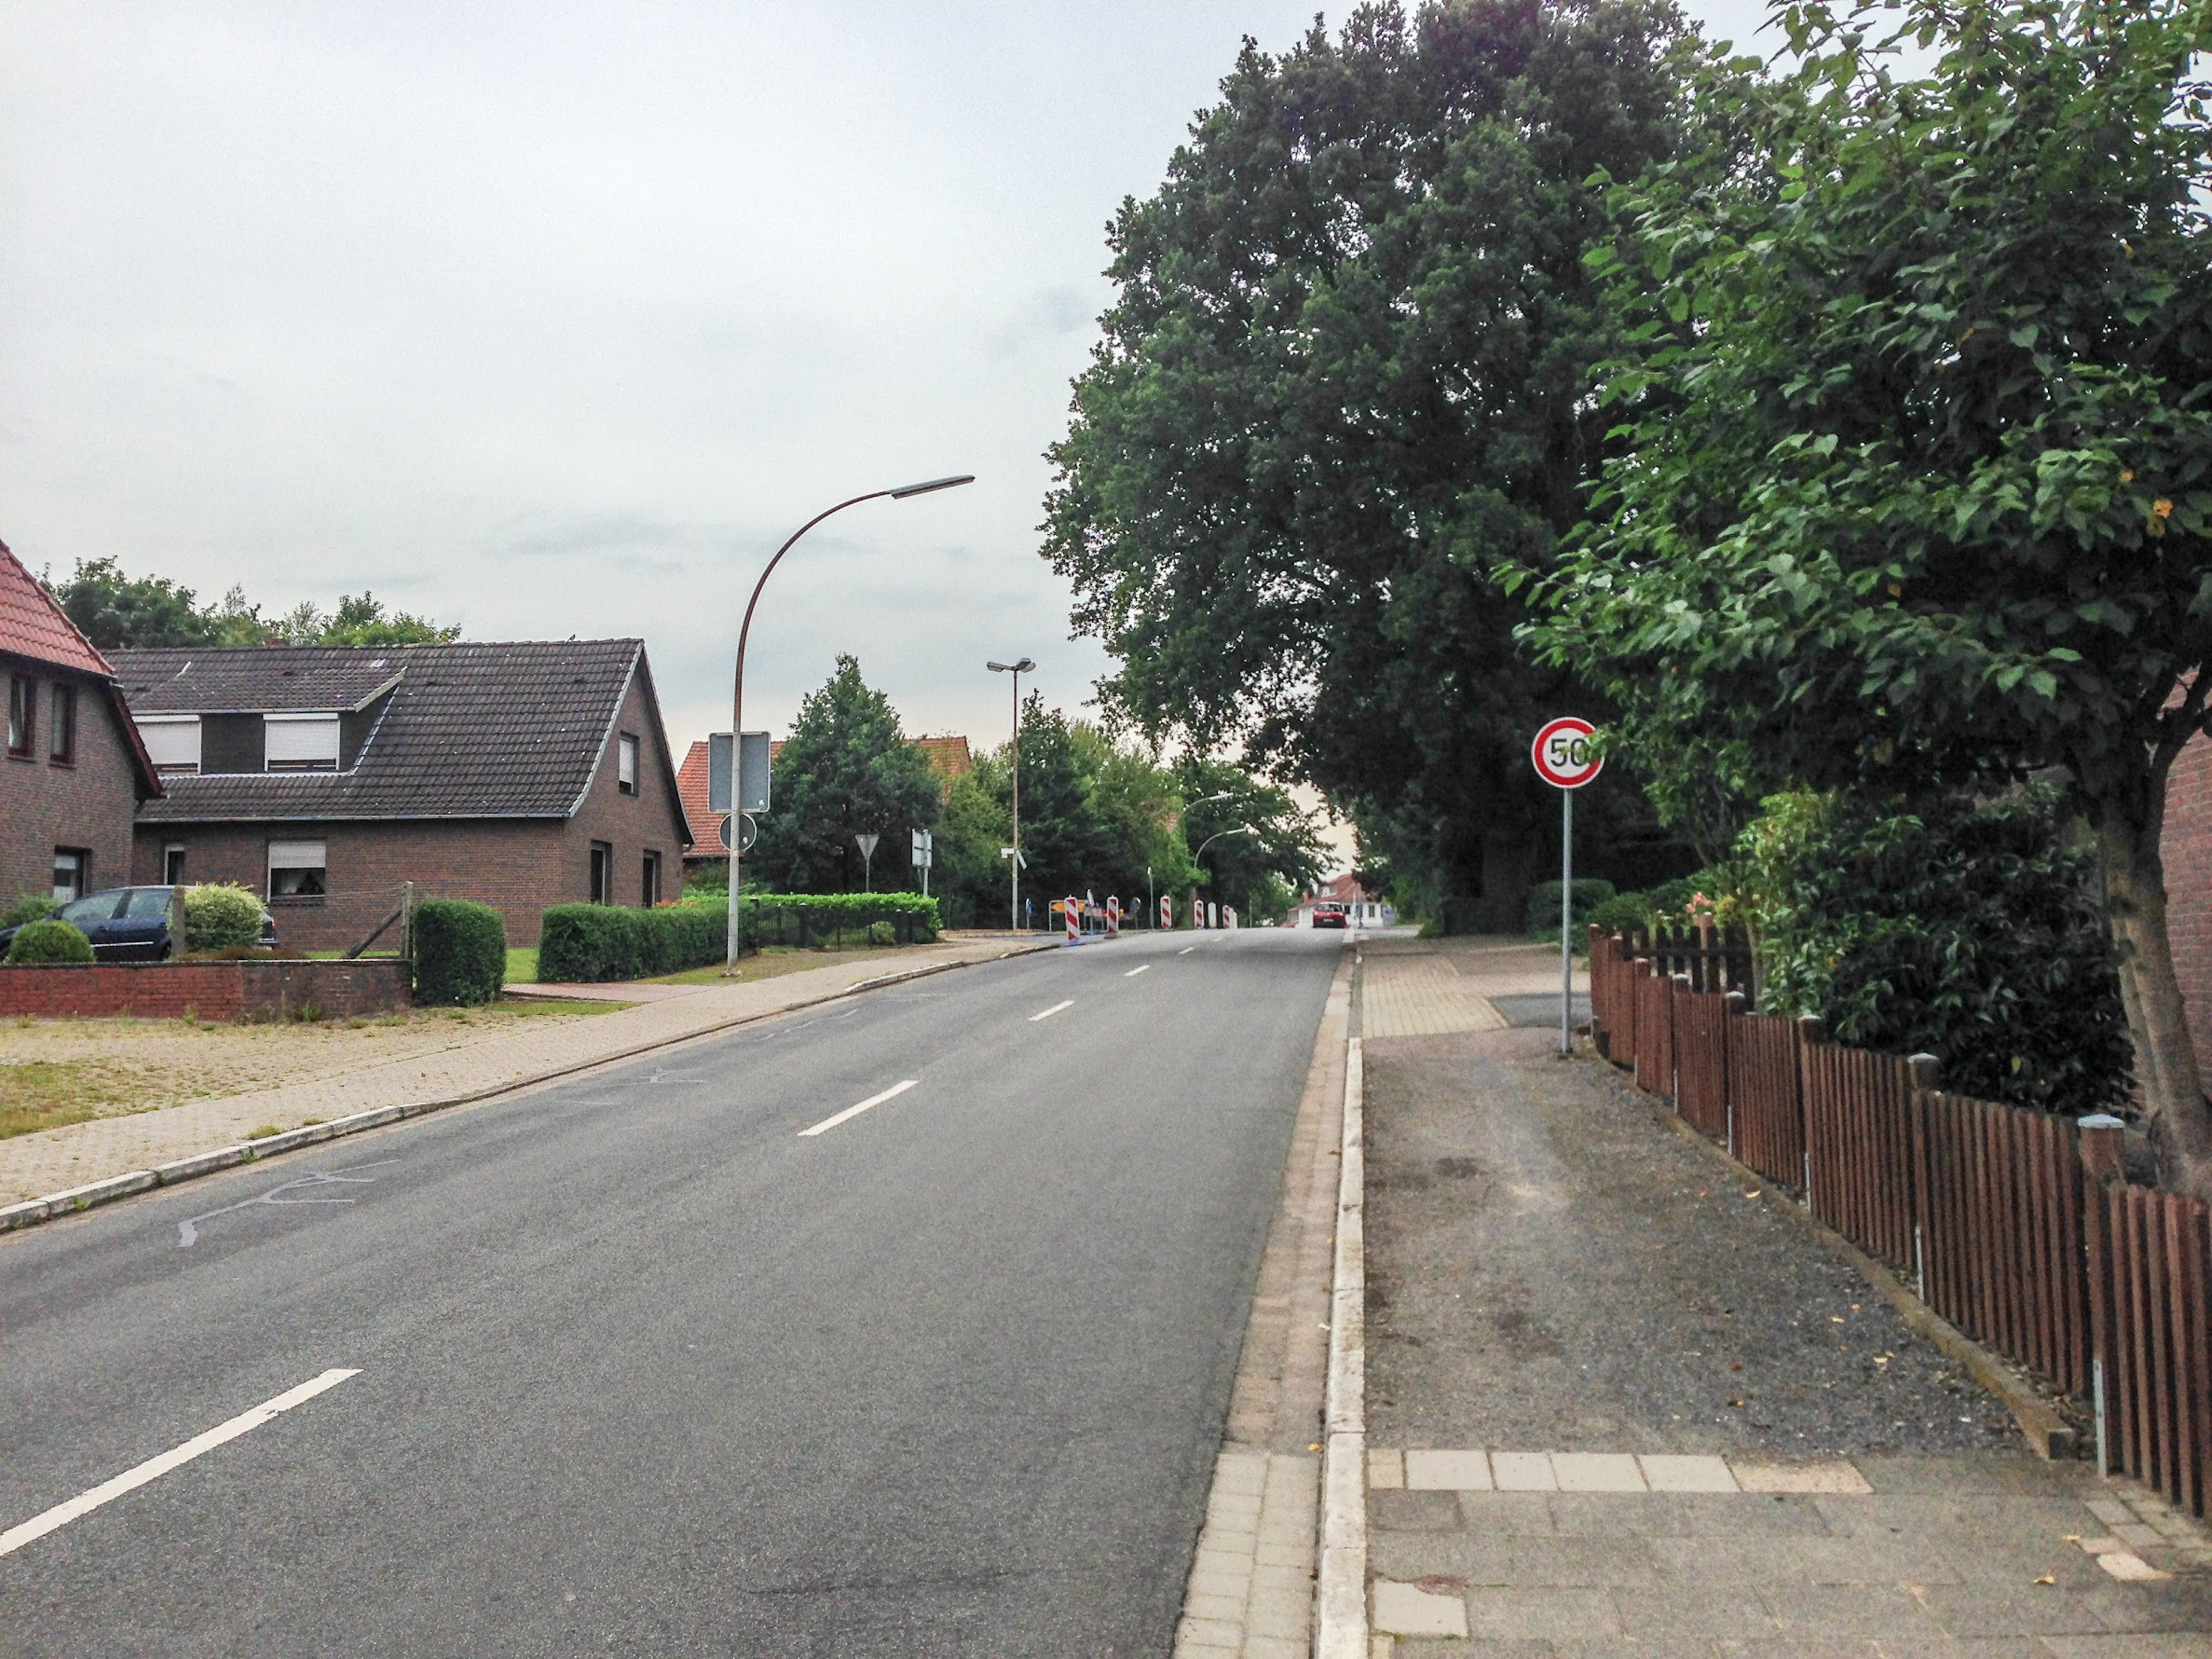 Wesermünder Str. in Osterholz-Scharmbeck